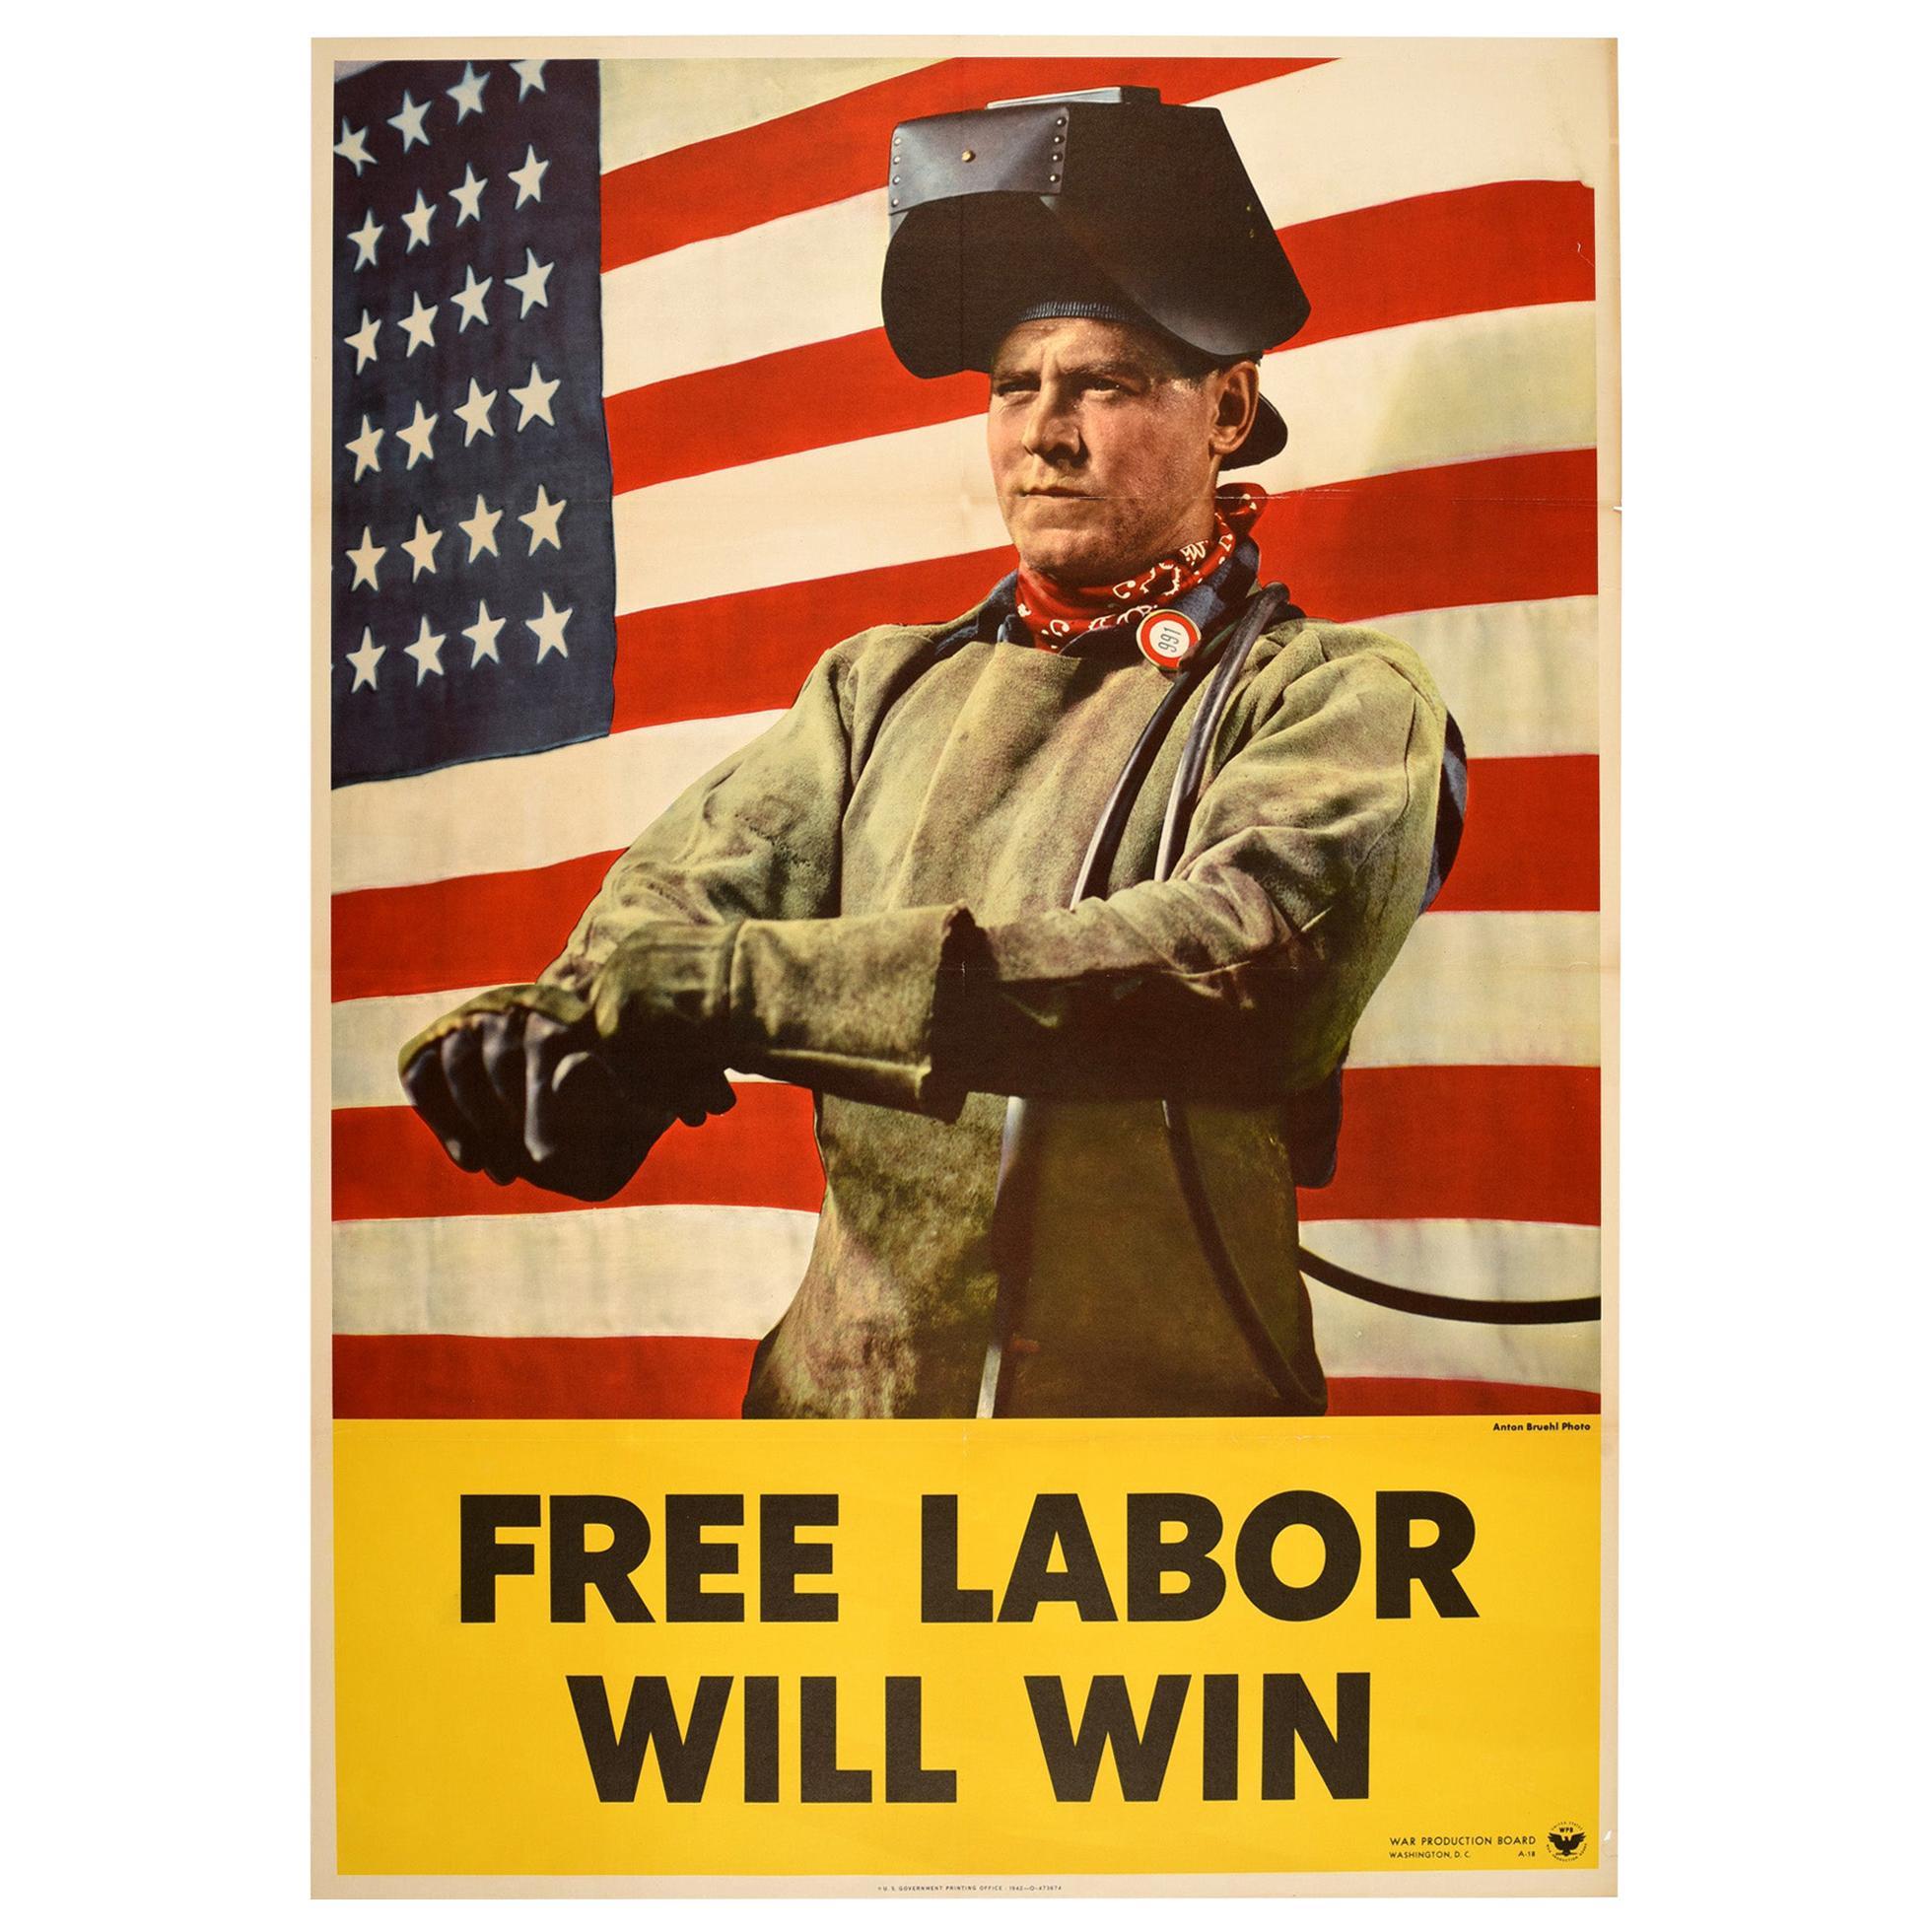 Original Vintage Poster Free Labor Will Win WWII Home Front Propaganda USA Flag